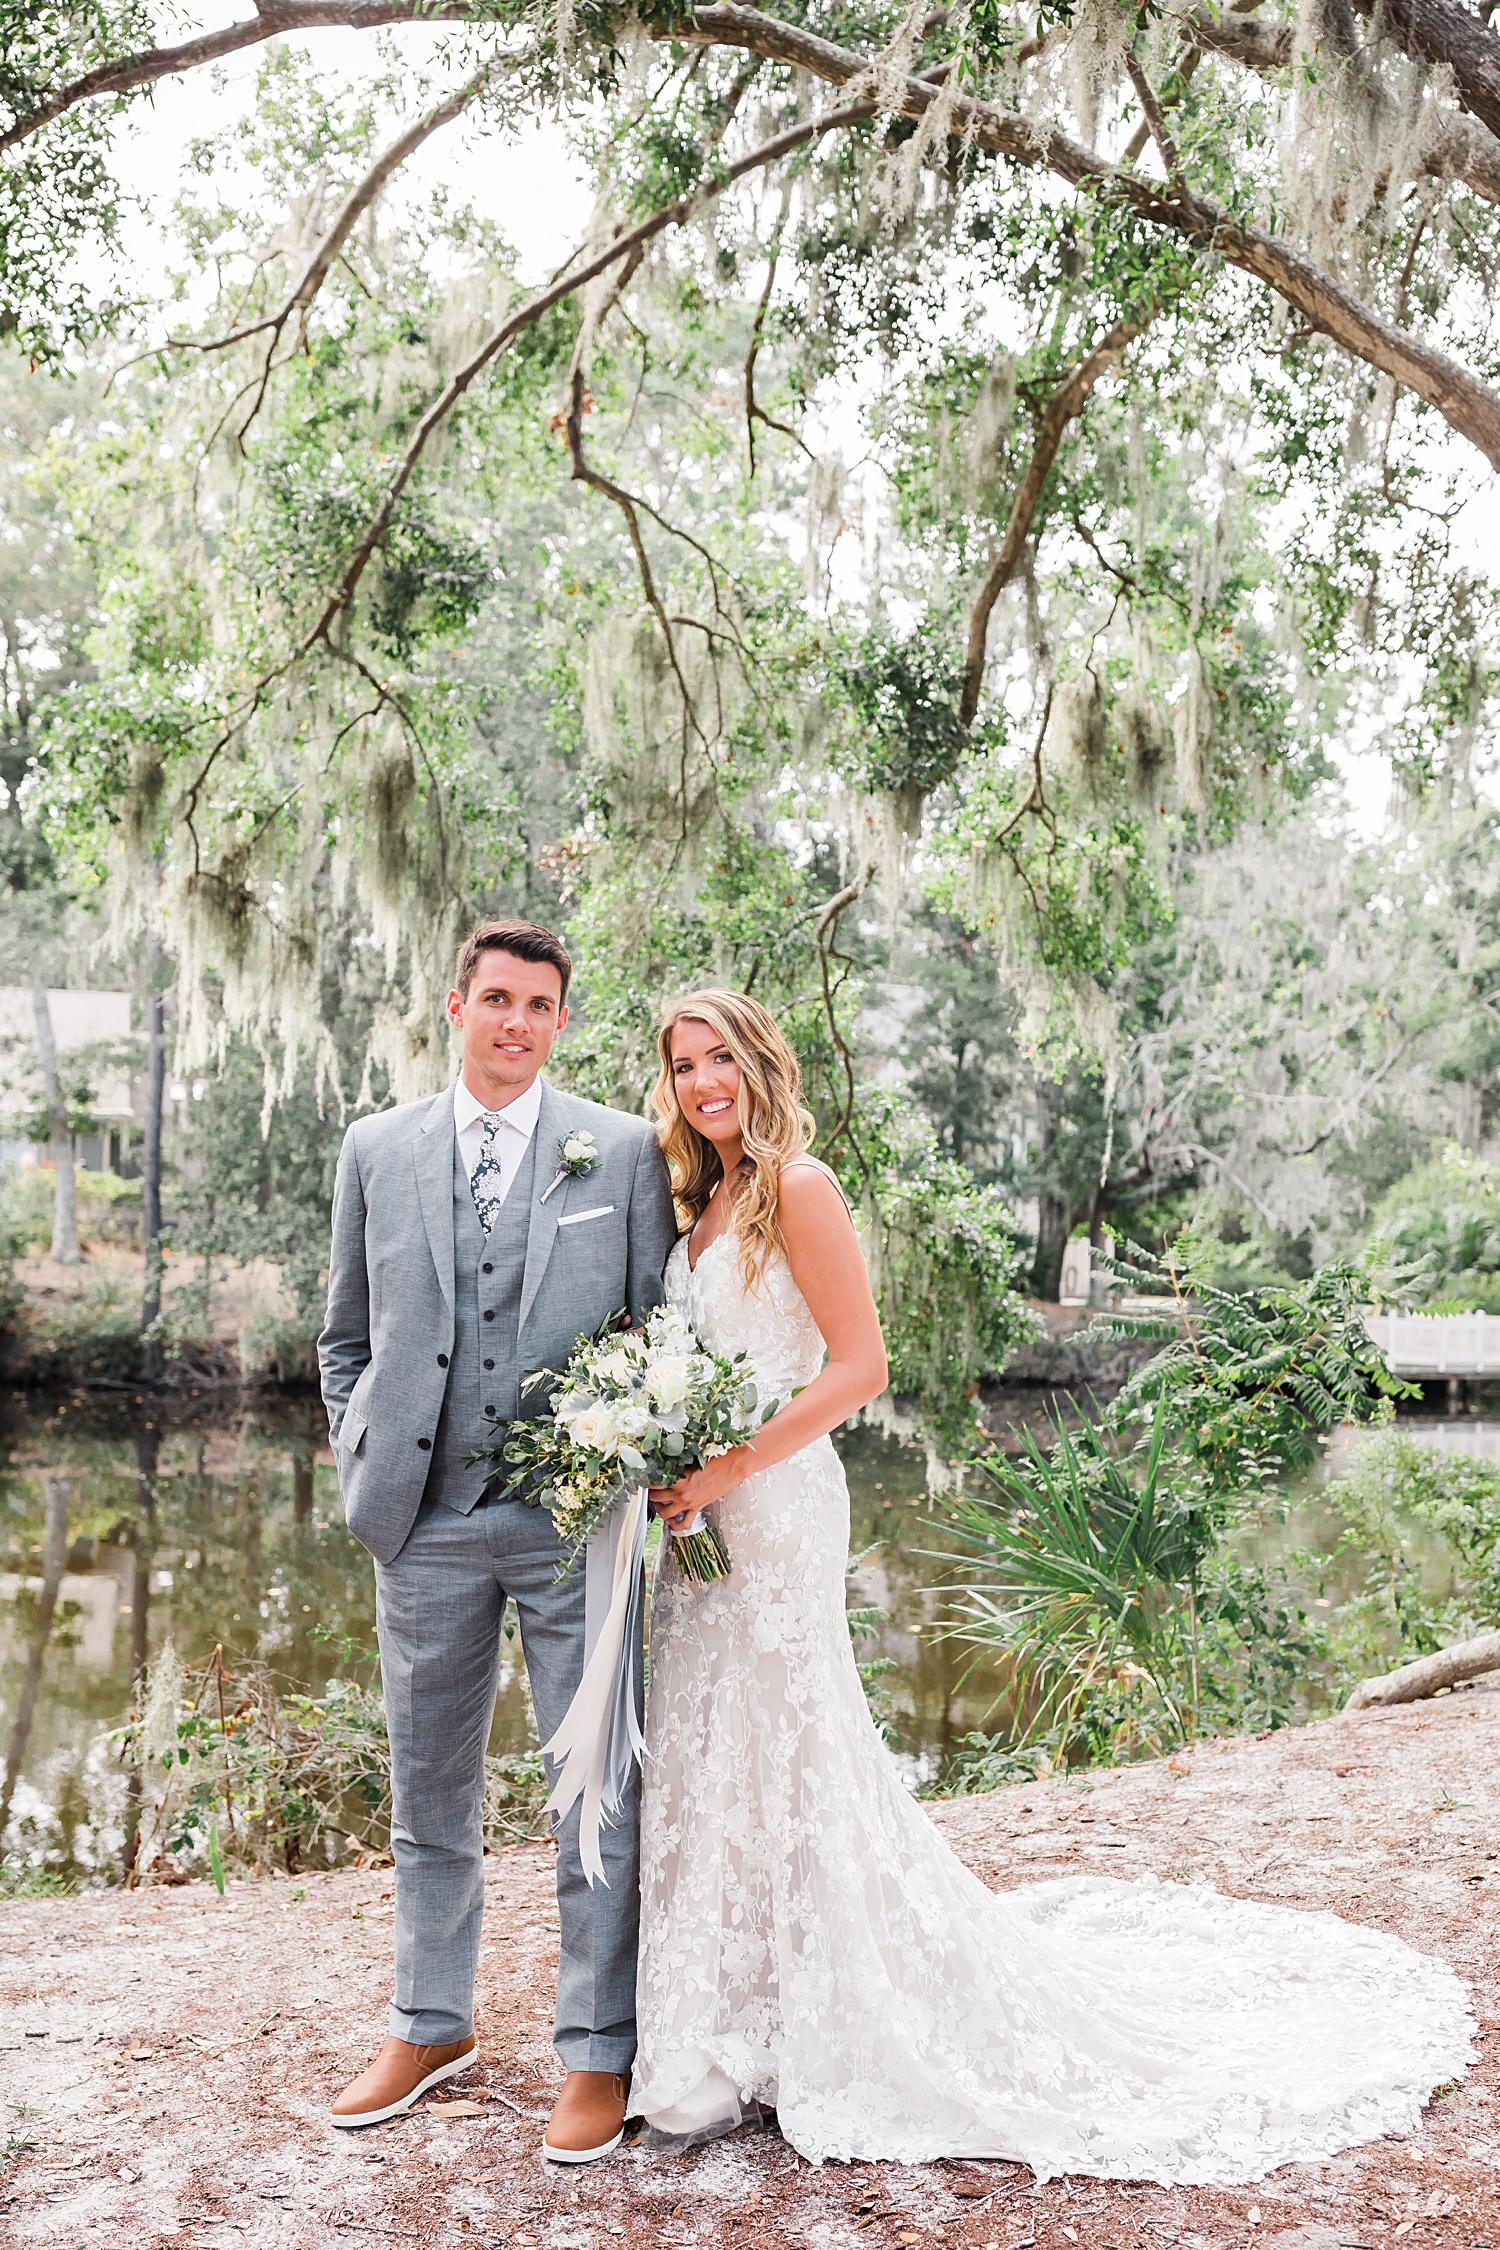 the-omni-hilton-head-wedding-photographer-jb-marie-photography